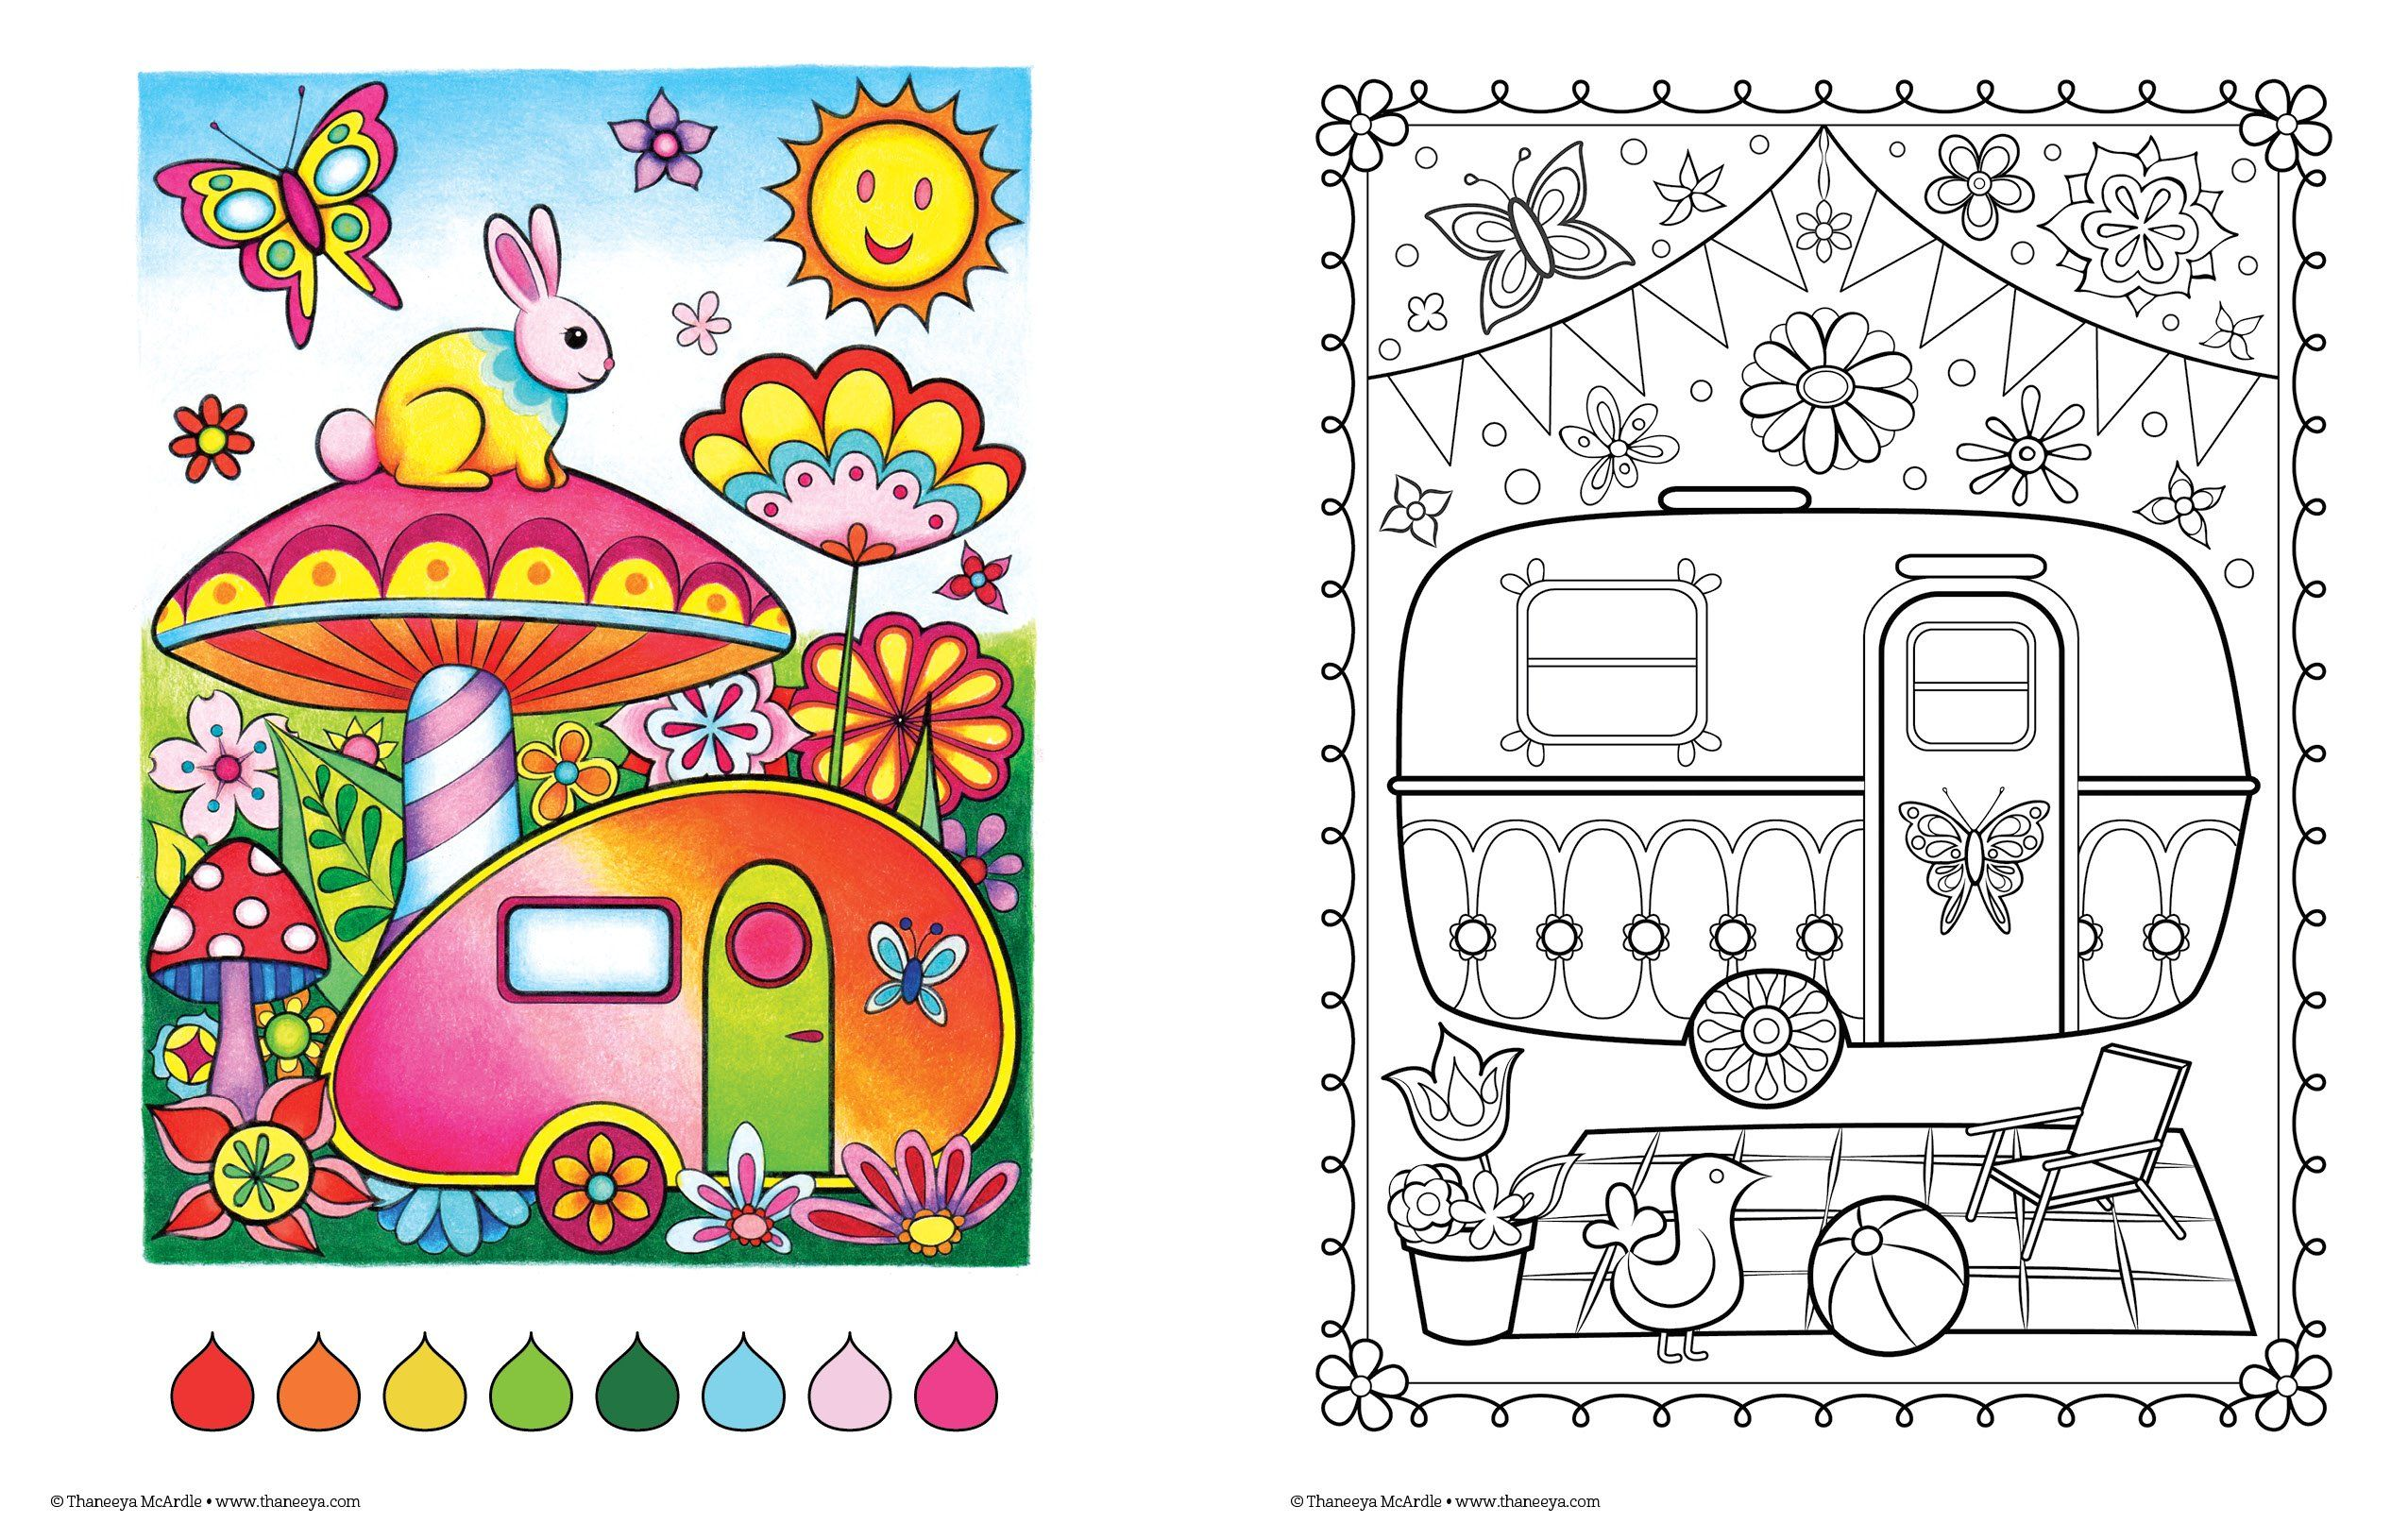 Happy Campers Coloring Book Design Originals Is Fun Thaneeya McArdle 9781574219654 Amazon Books